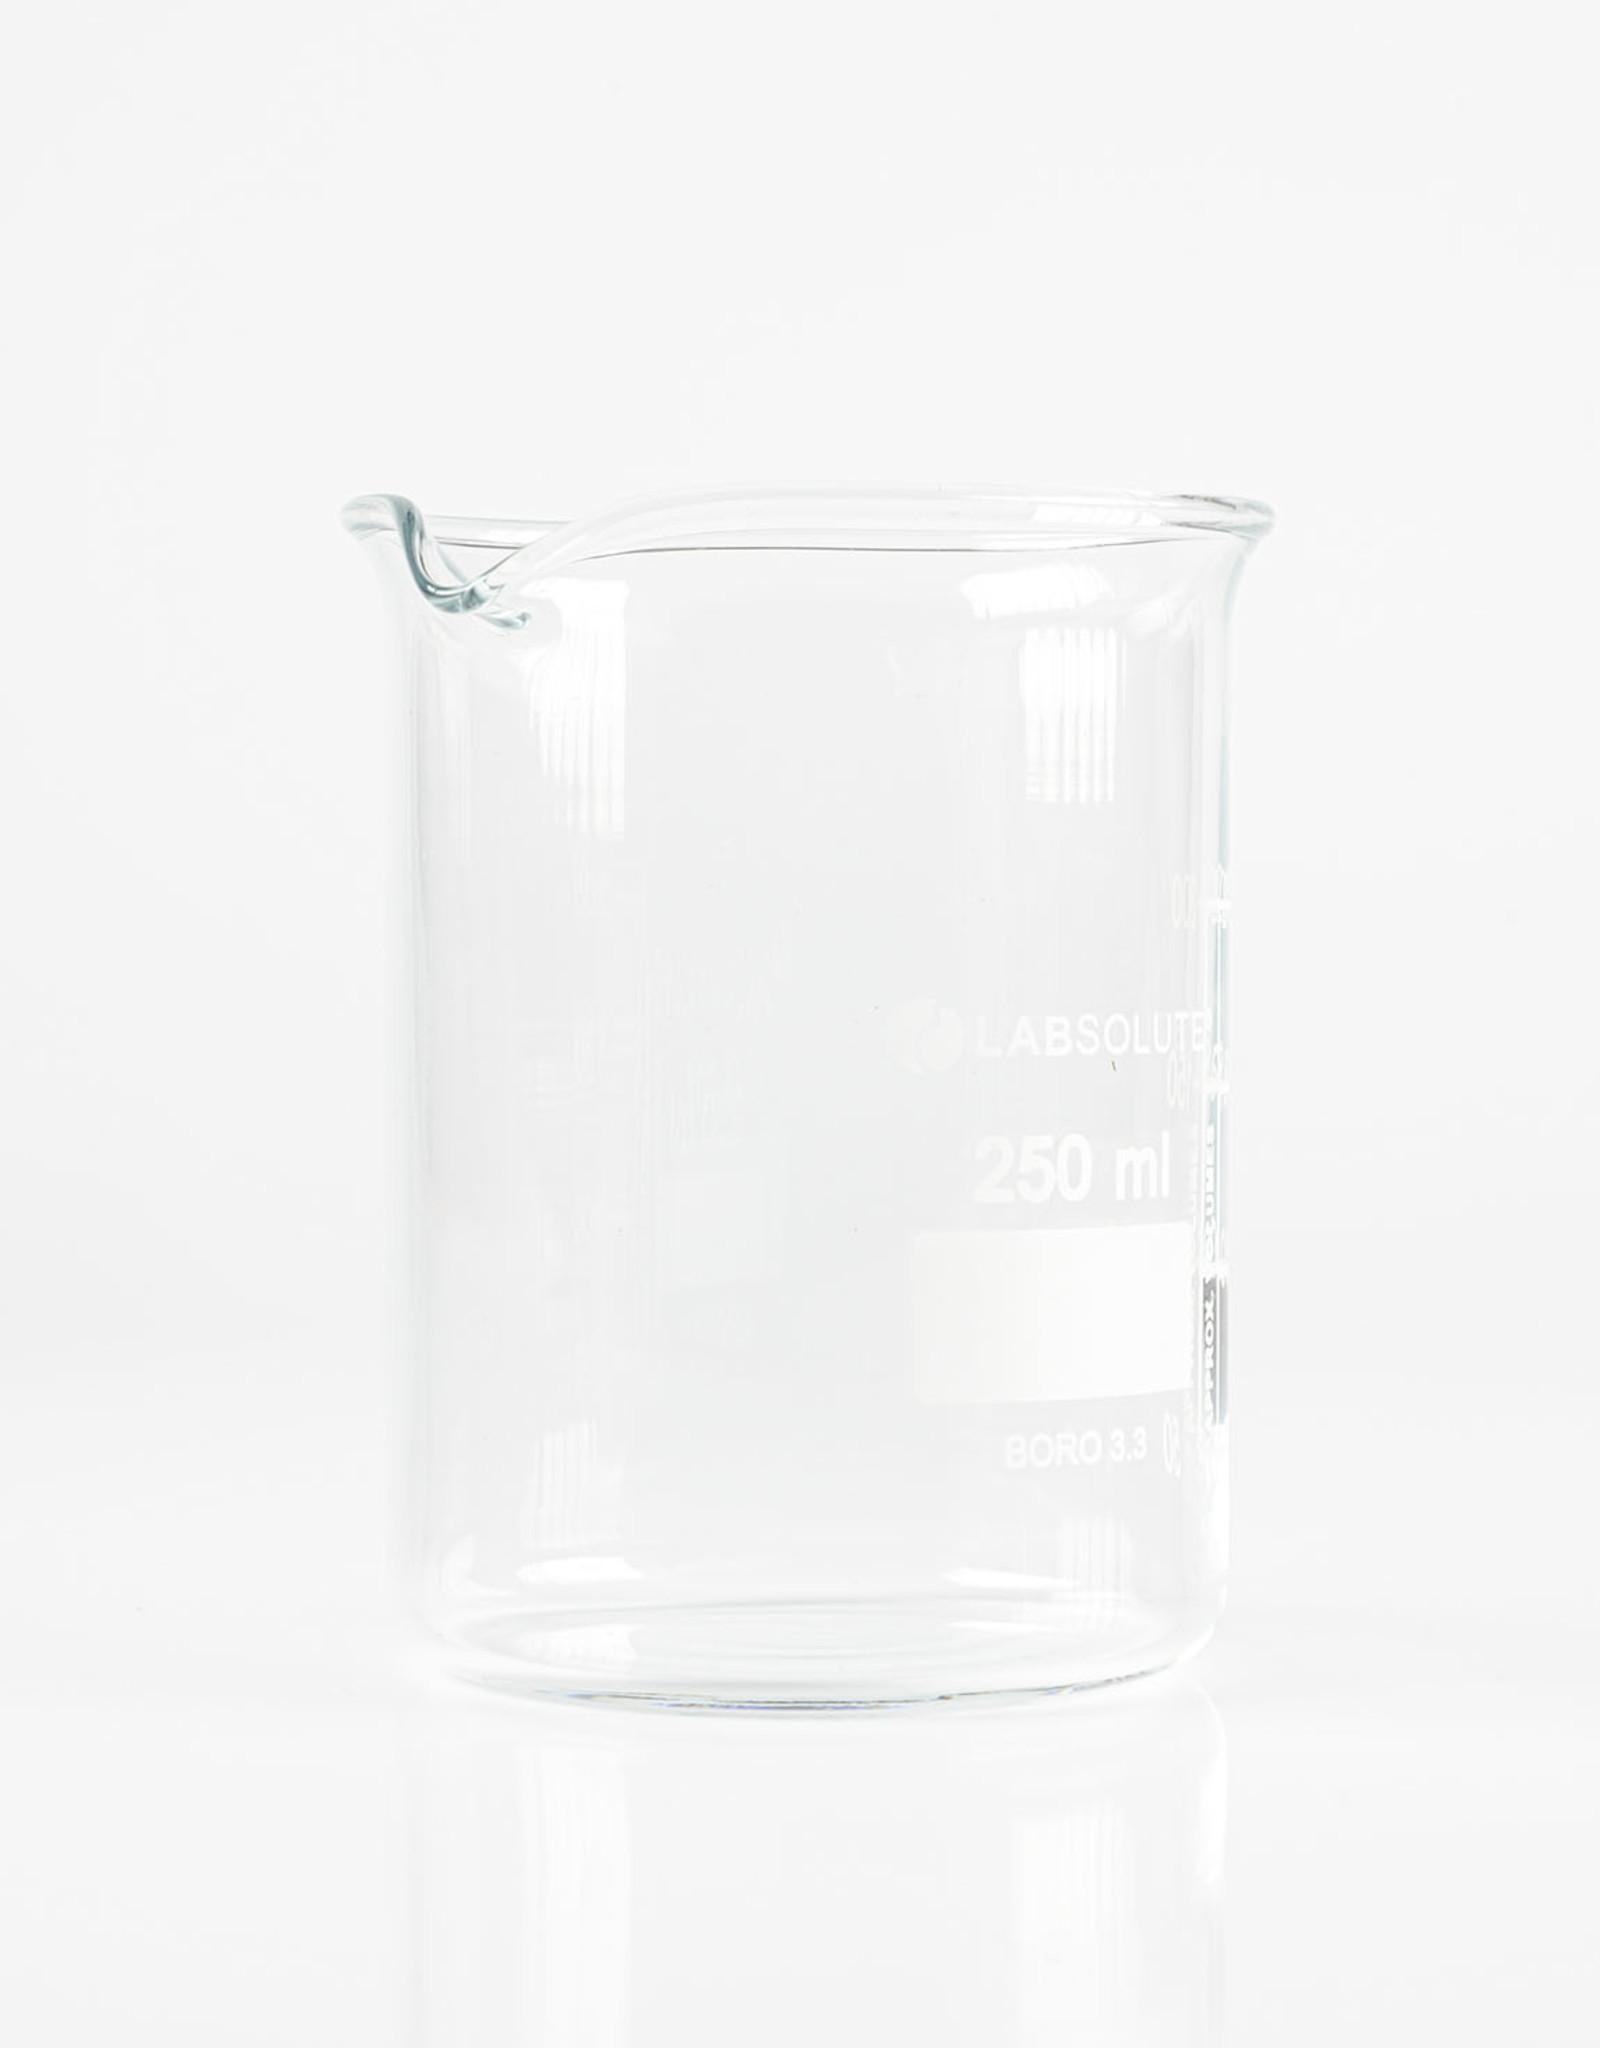 MarionMaakt Fireproof measuring cup